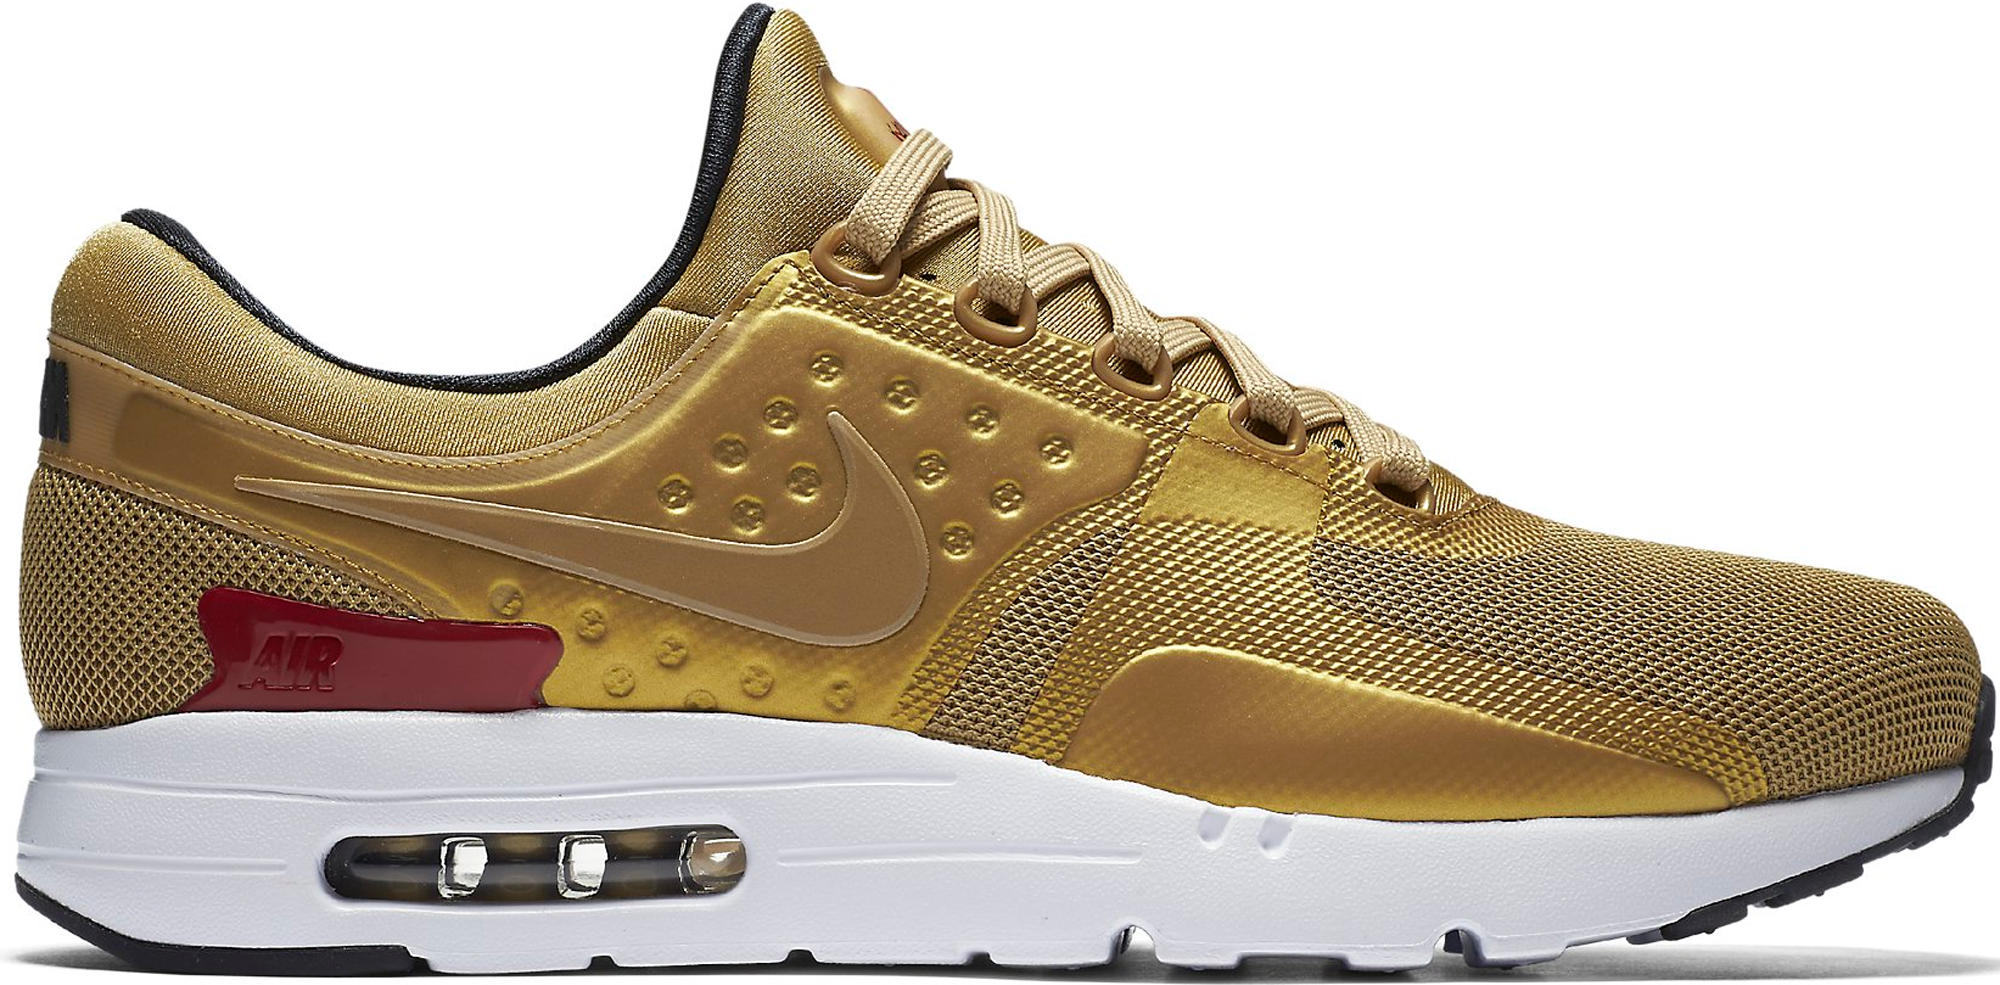 Air Max Zero Metallic Gold